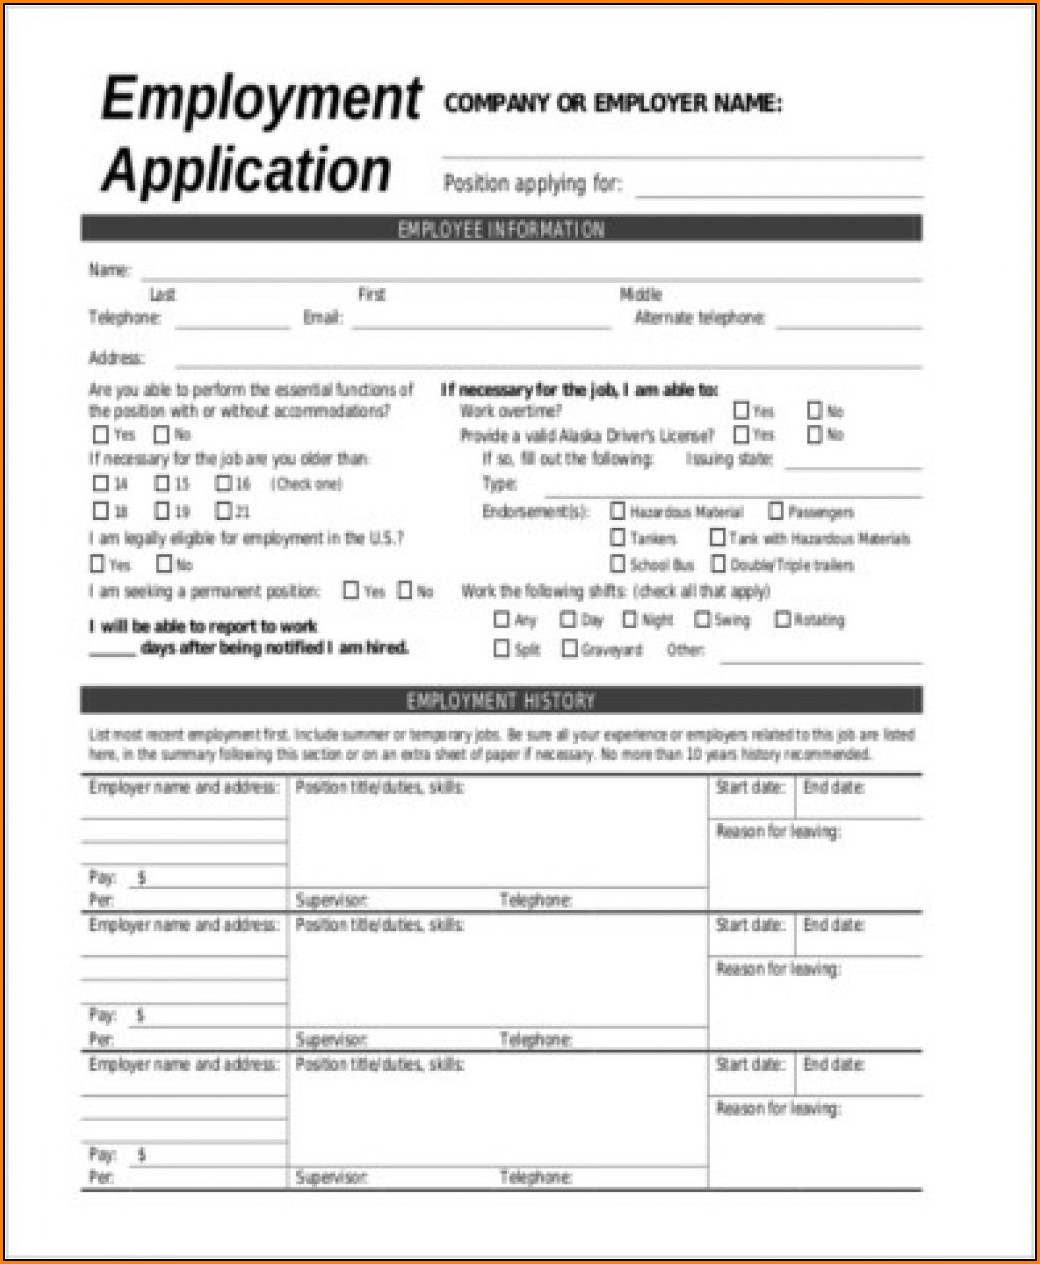 Blank General Employment Application Form